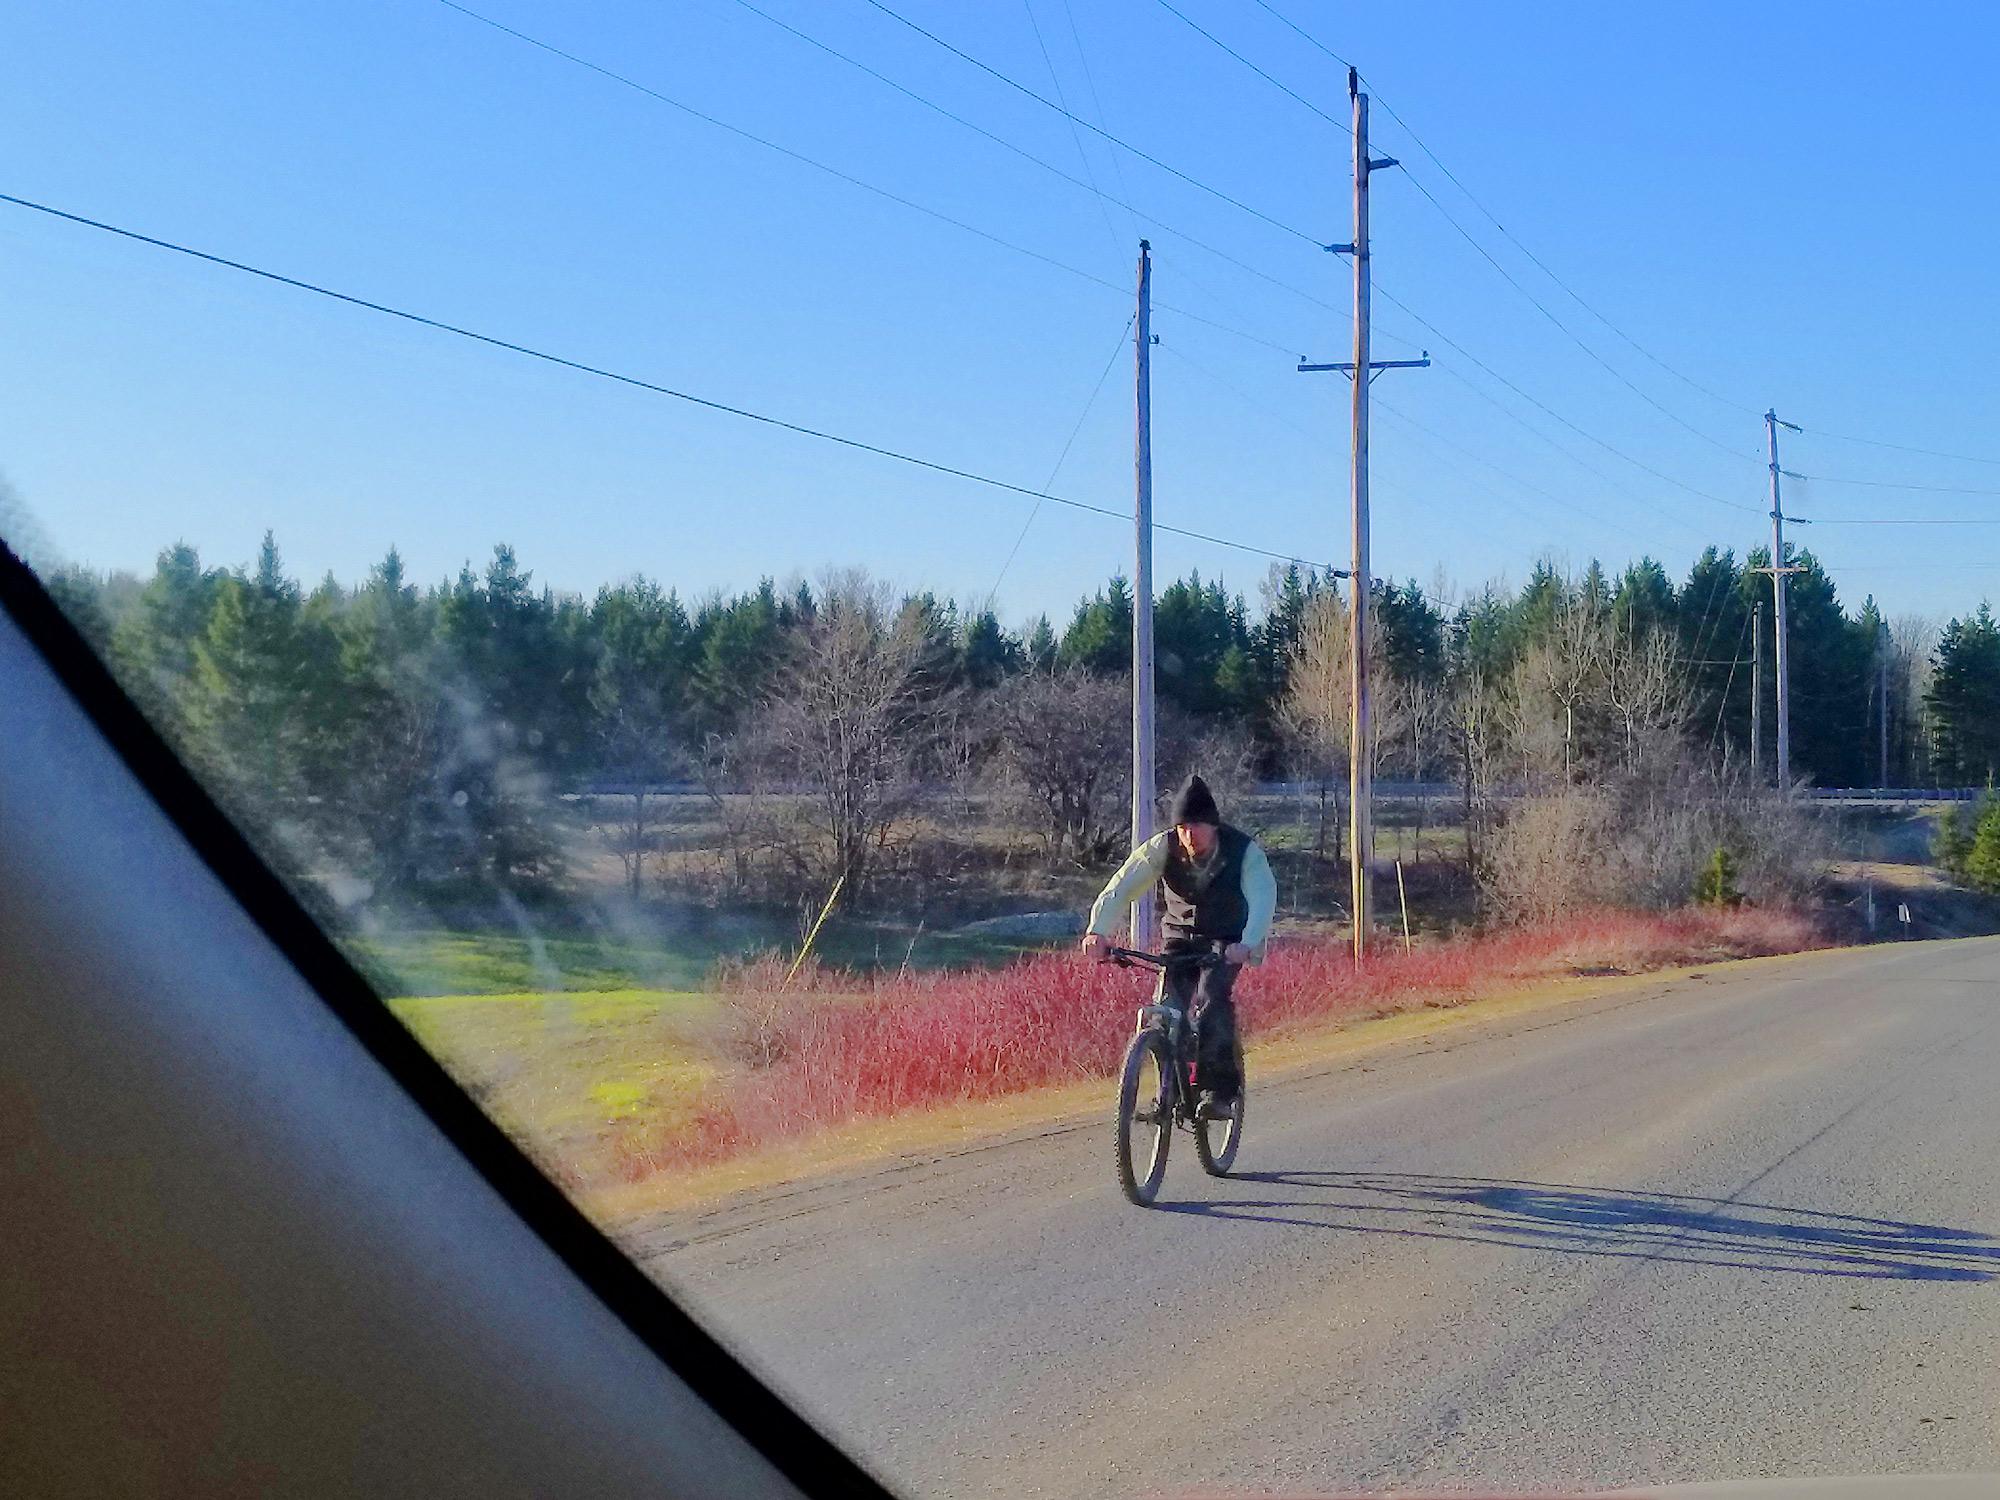 amish traffic on maine roads